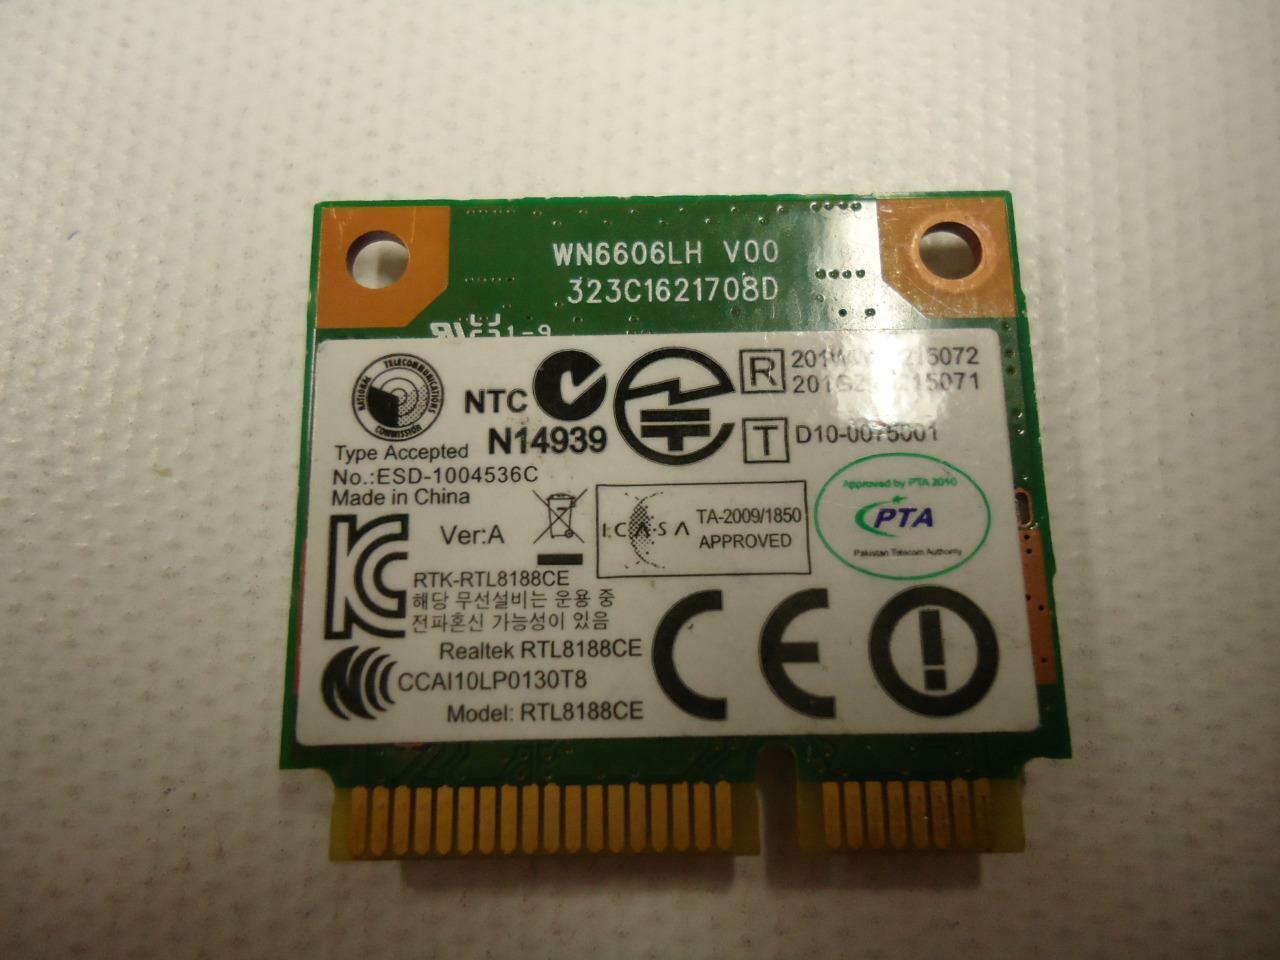 Realtek RTL8188CE 802.11b/g/n Wireless Half Mini Card WN6606LH Lenovo Thinkpad image 2